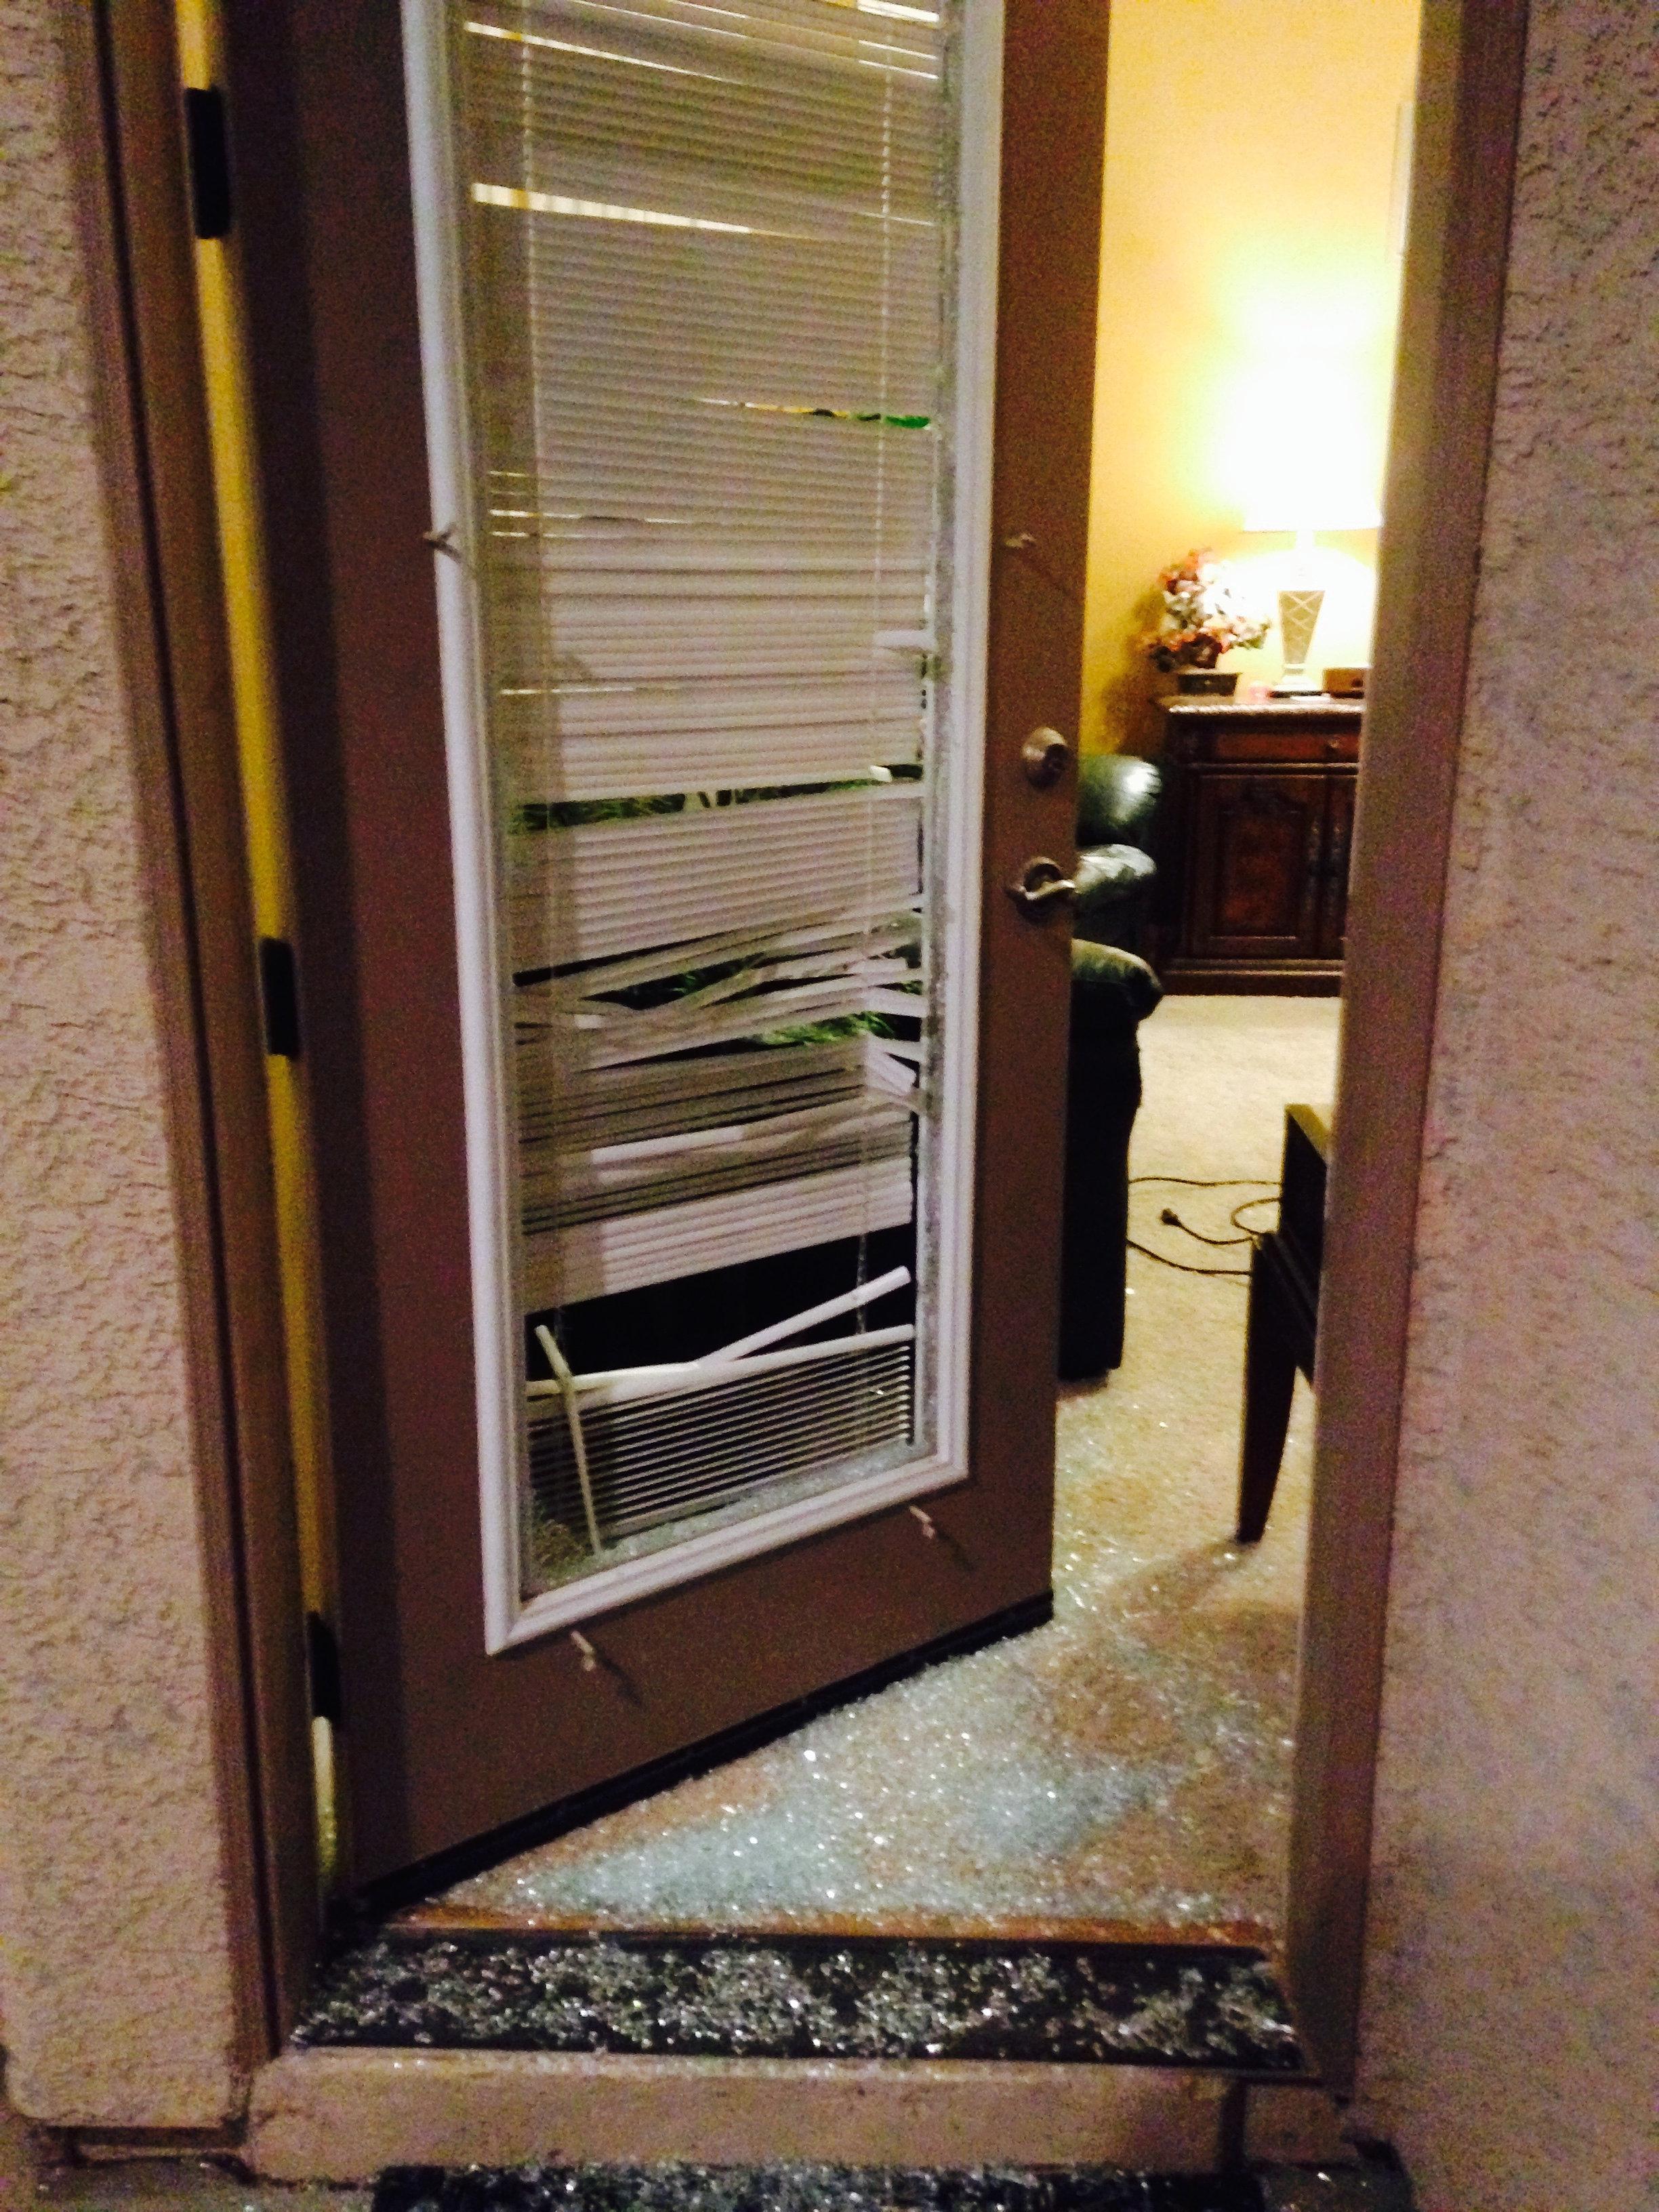 Paramount Glass Shop Las Vegas mercial Door Replacement Install